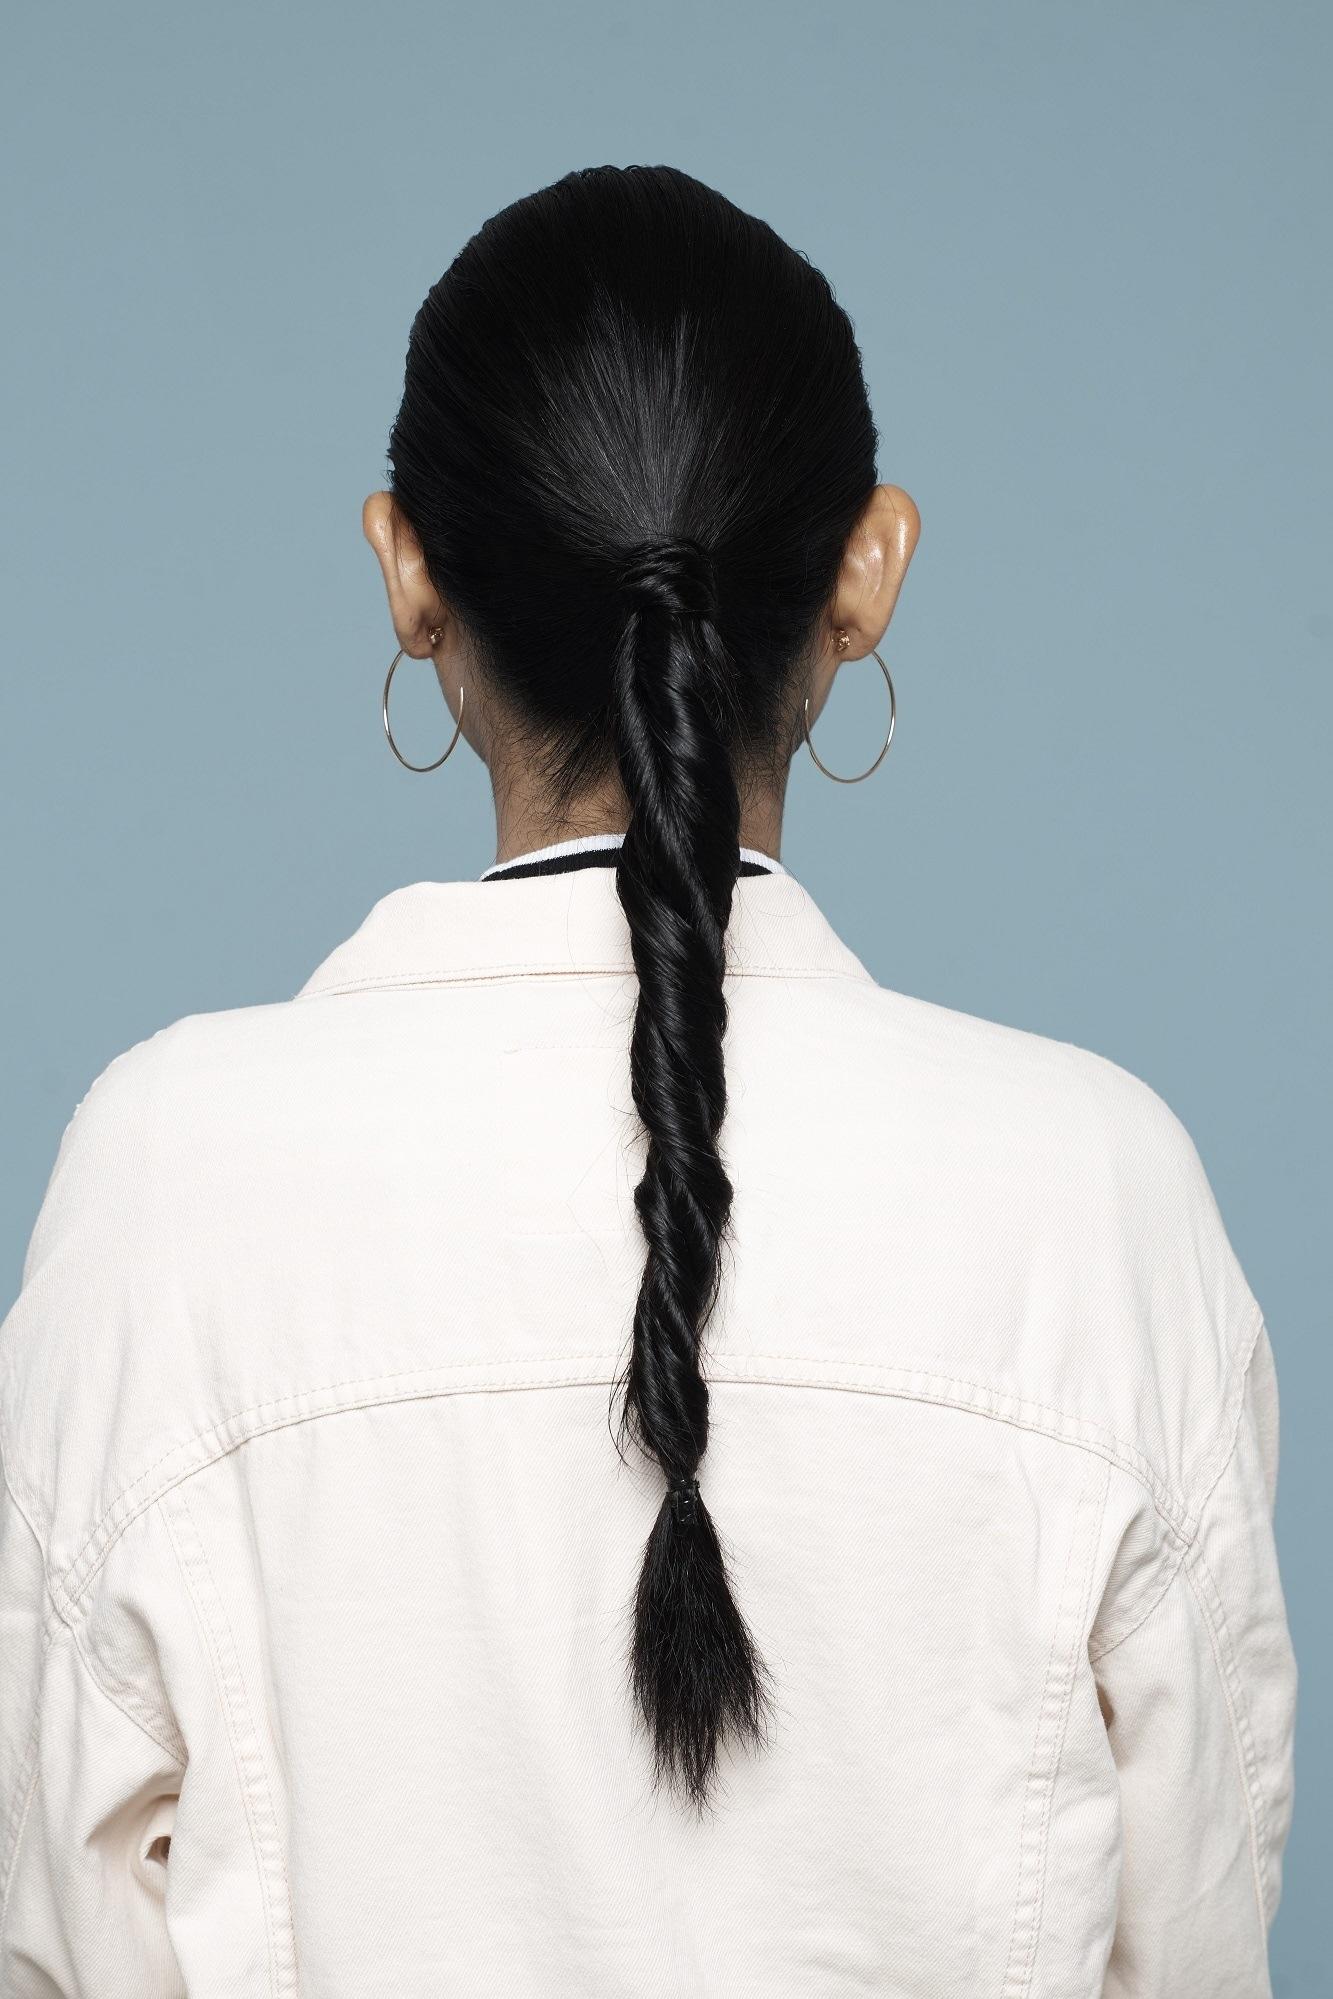 gaya rambut Double rope braid ponytail saat listrik mati